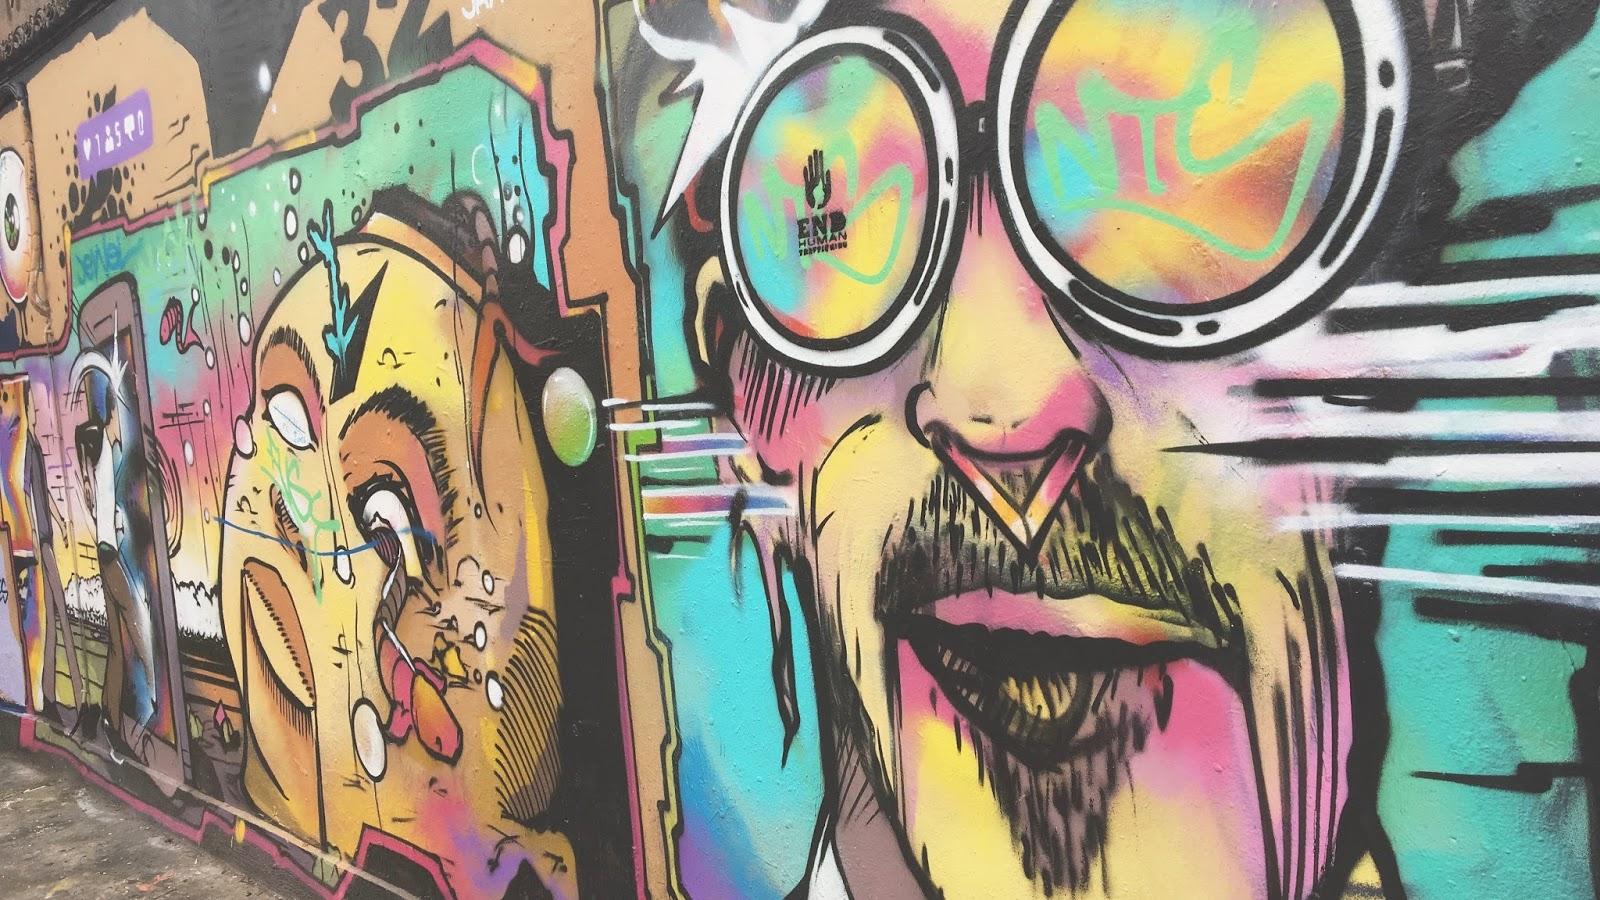 Brick Lane Graffiti Art 2017